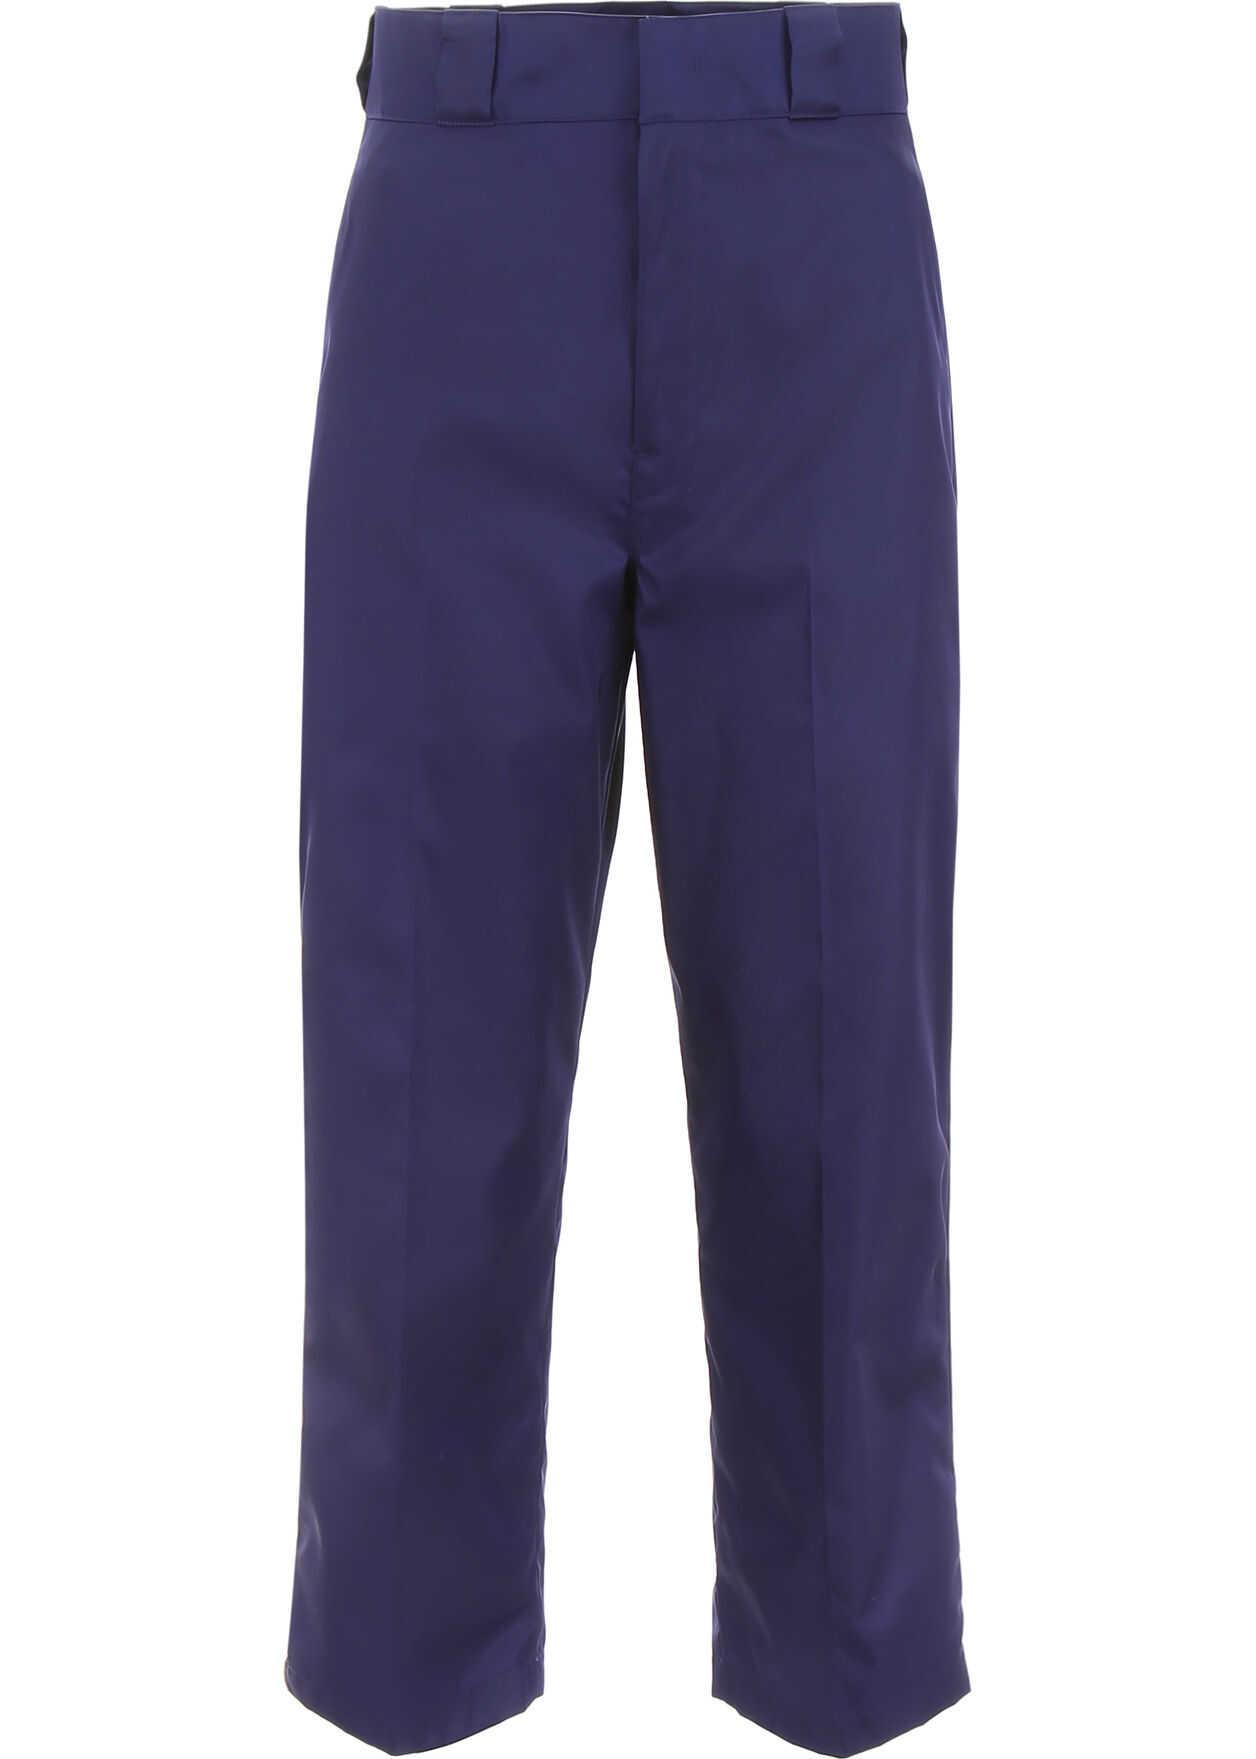 Prada Nylon Trousers INCHIOSTRO